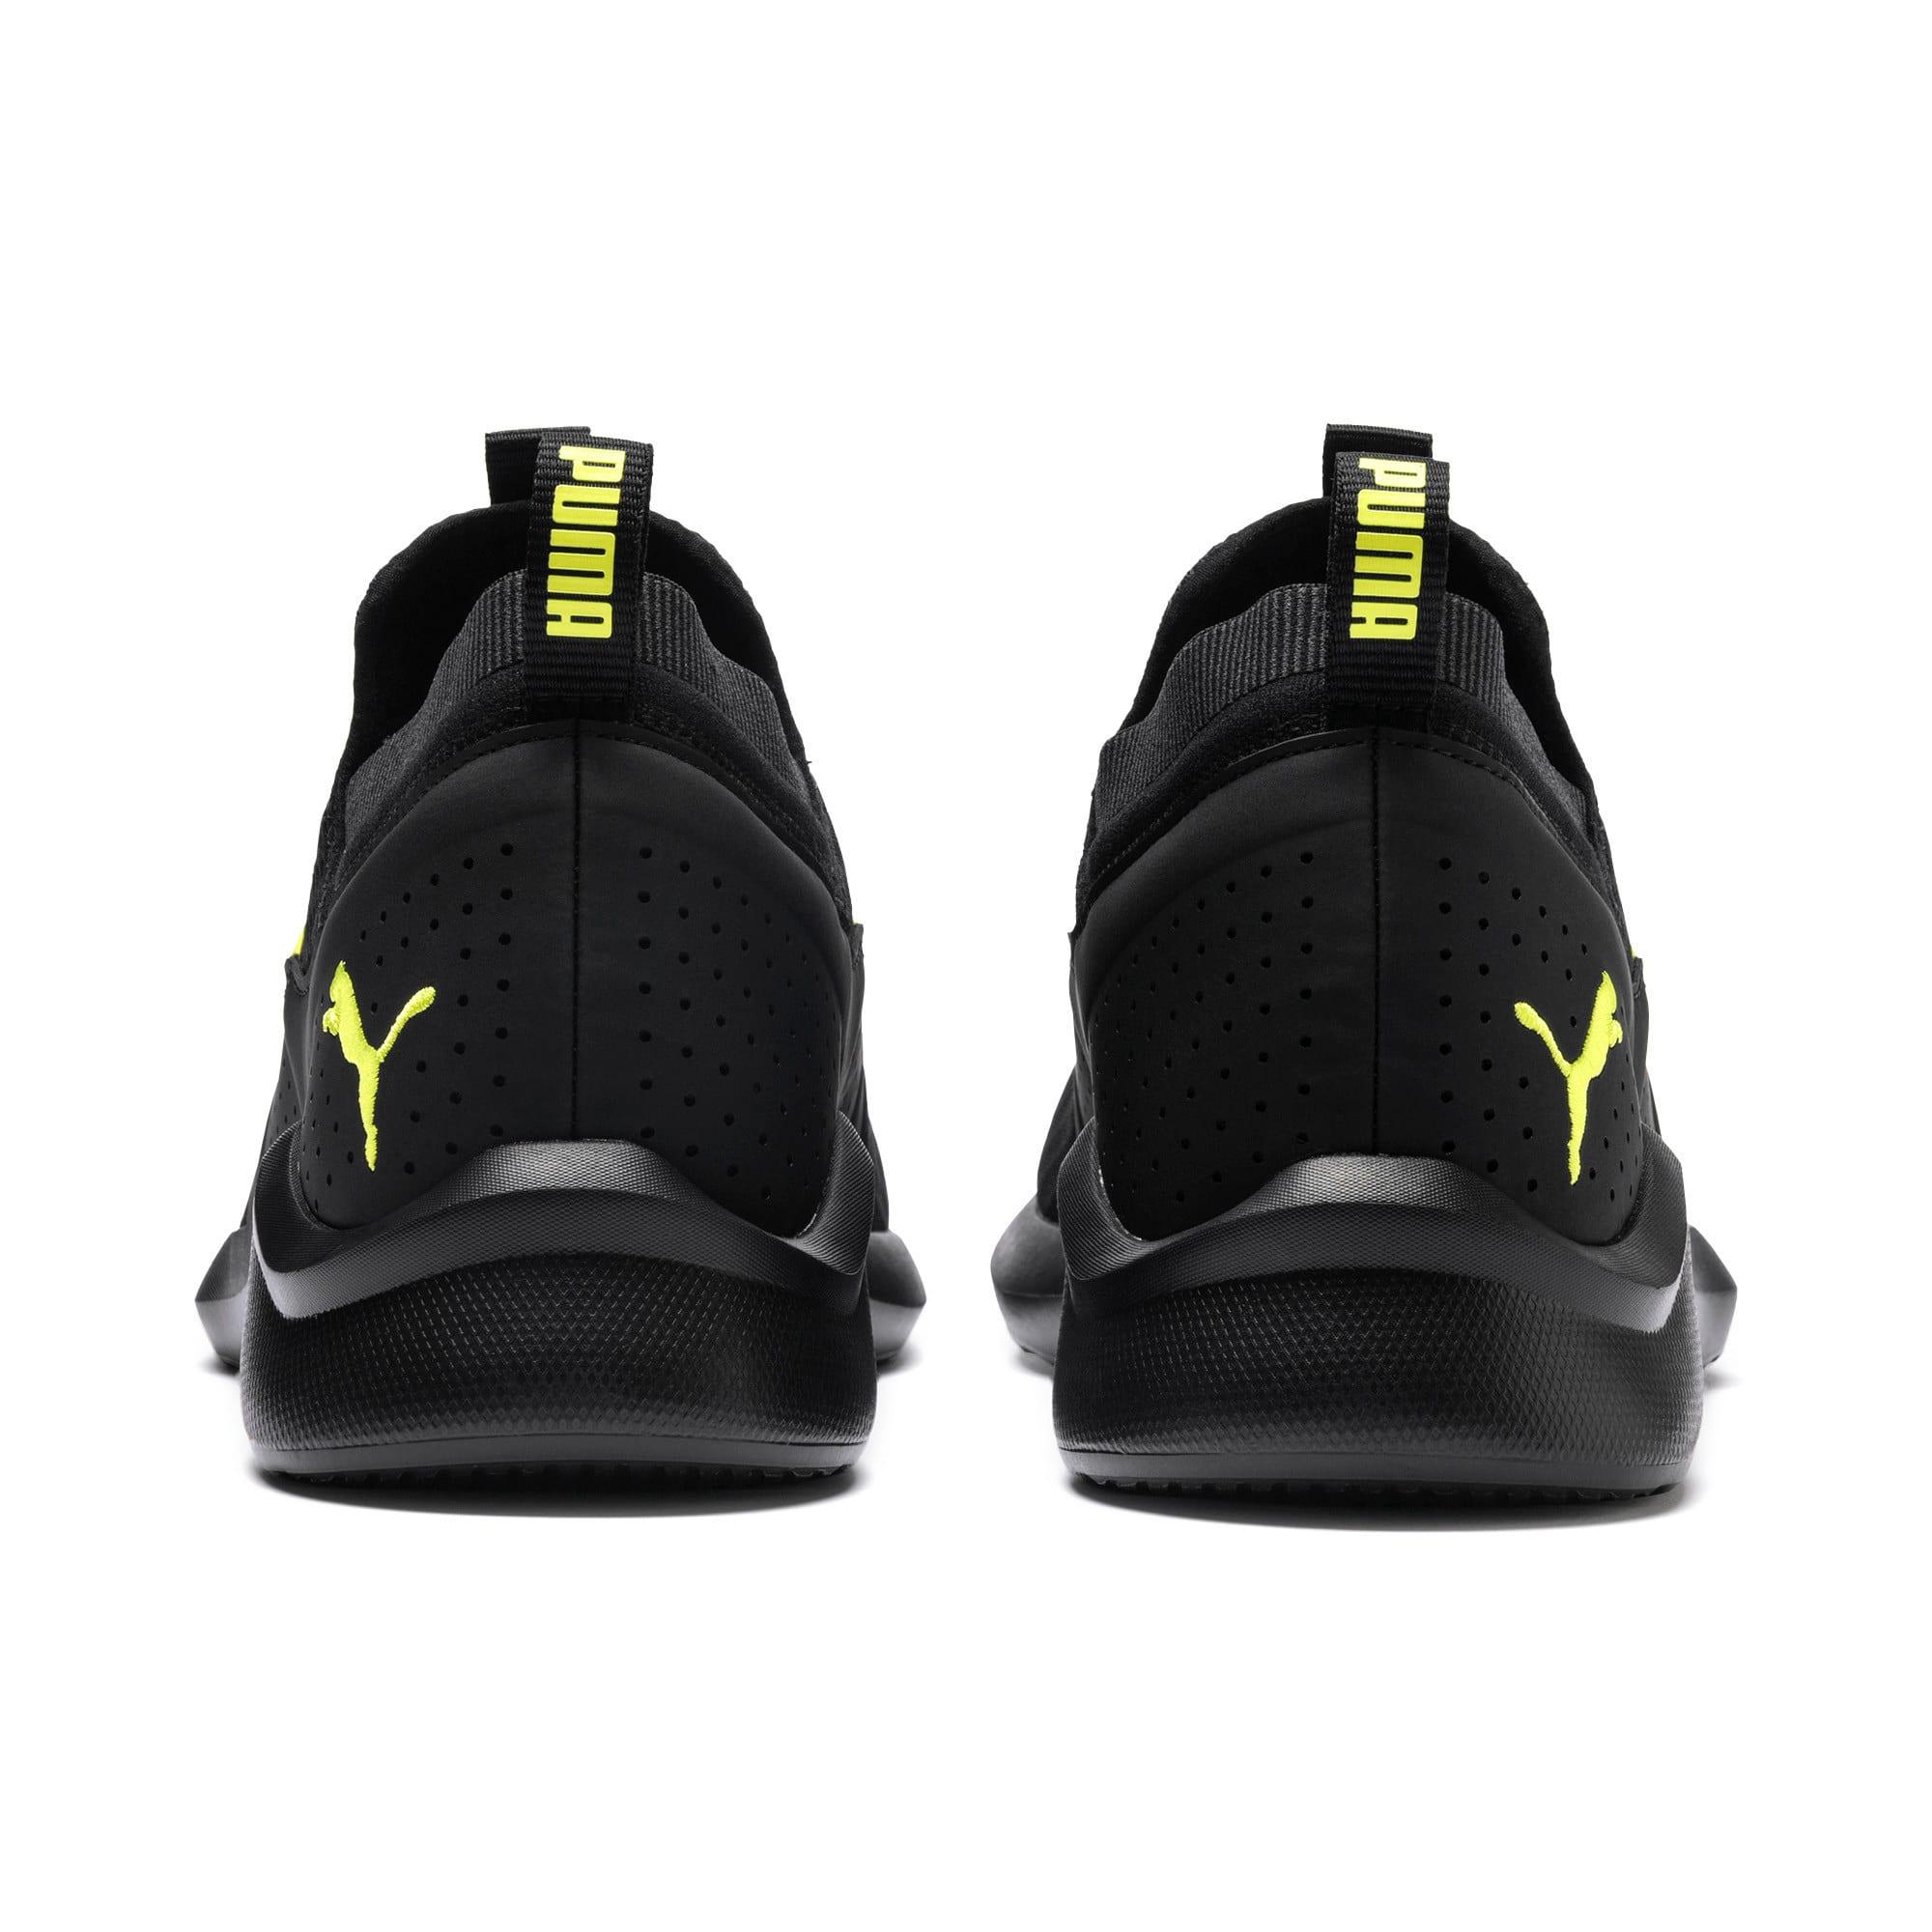 Thumbnail 4 of Emergence Future Men's Training Shoes, Black-Charcoal-Yellow, medium